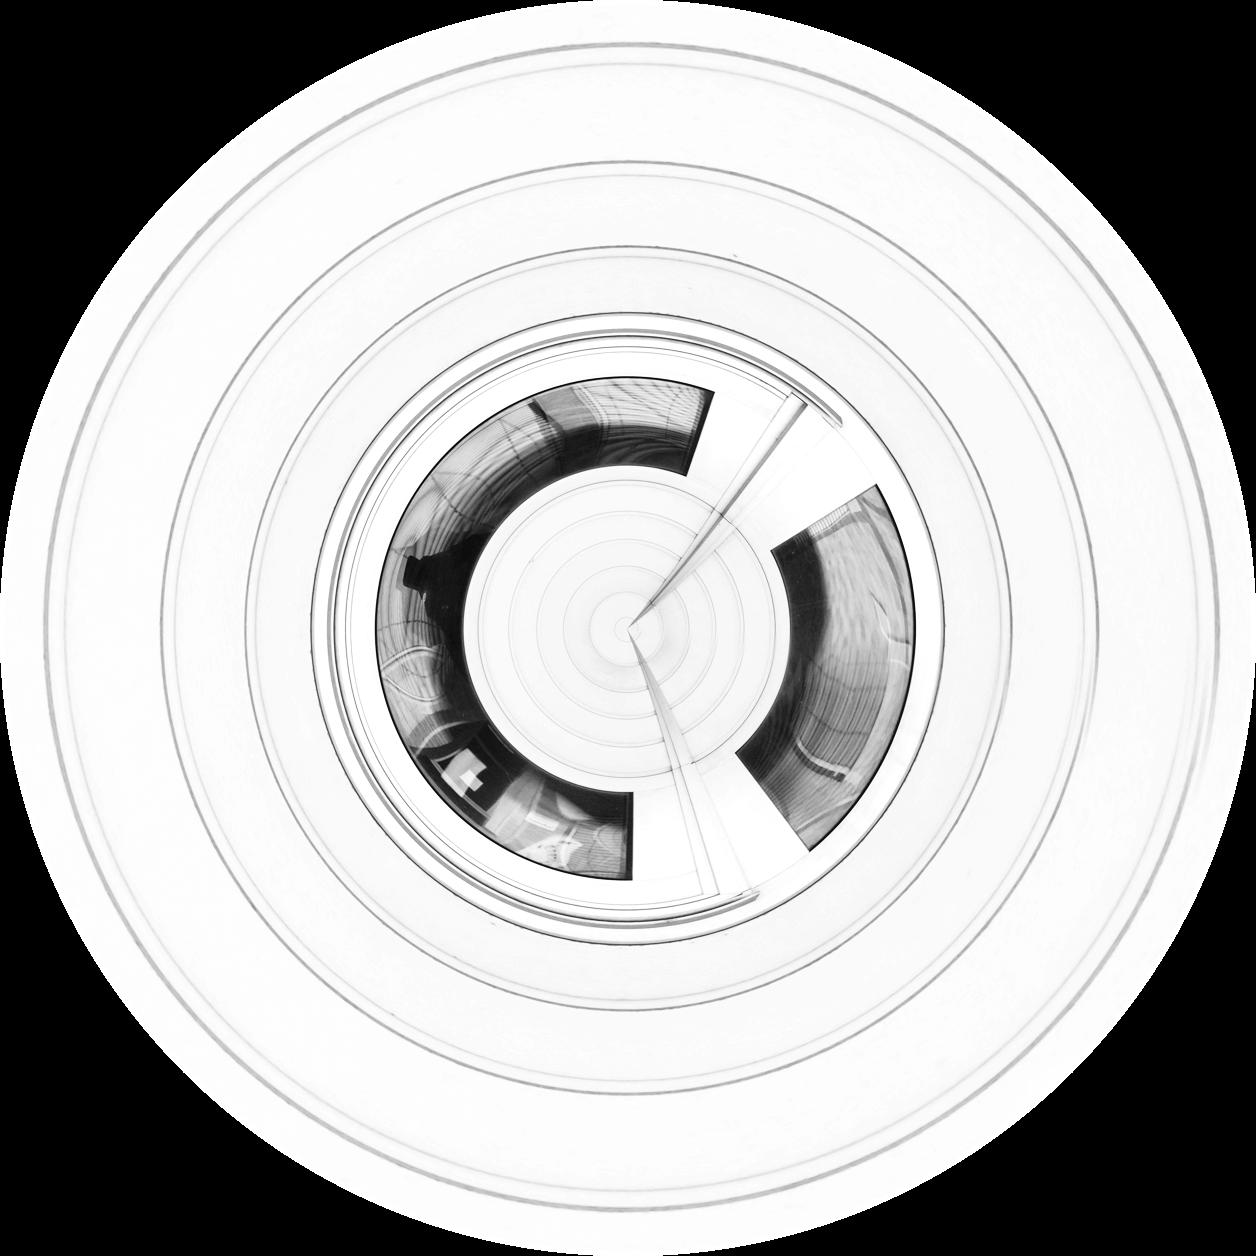 graph-wheel-2.png